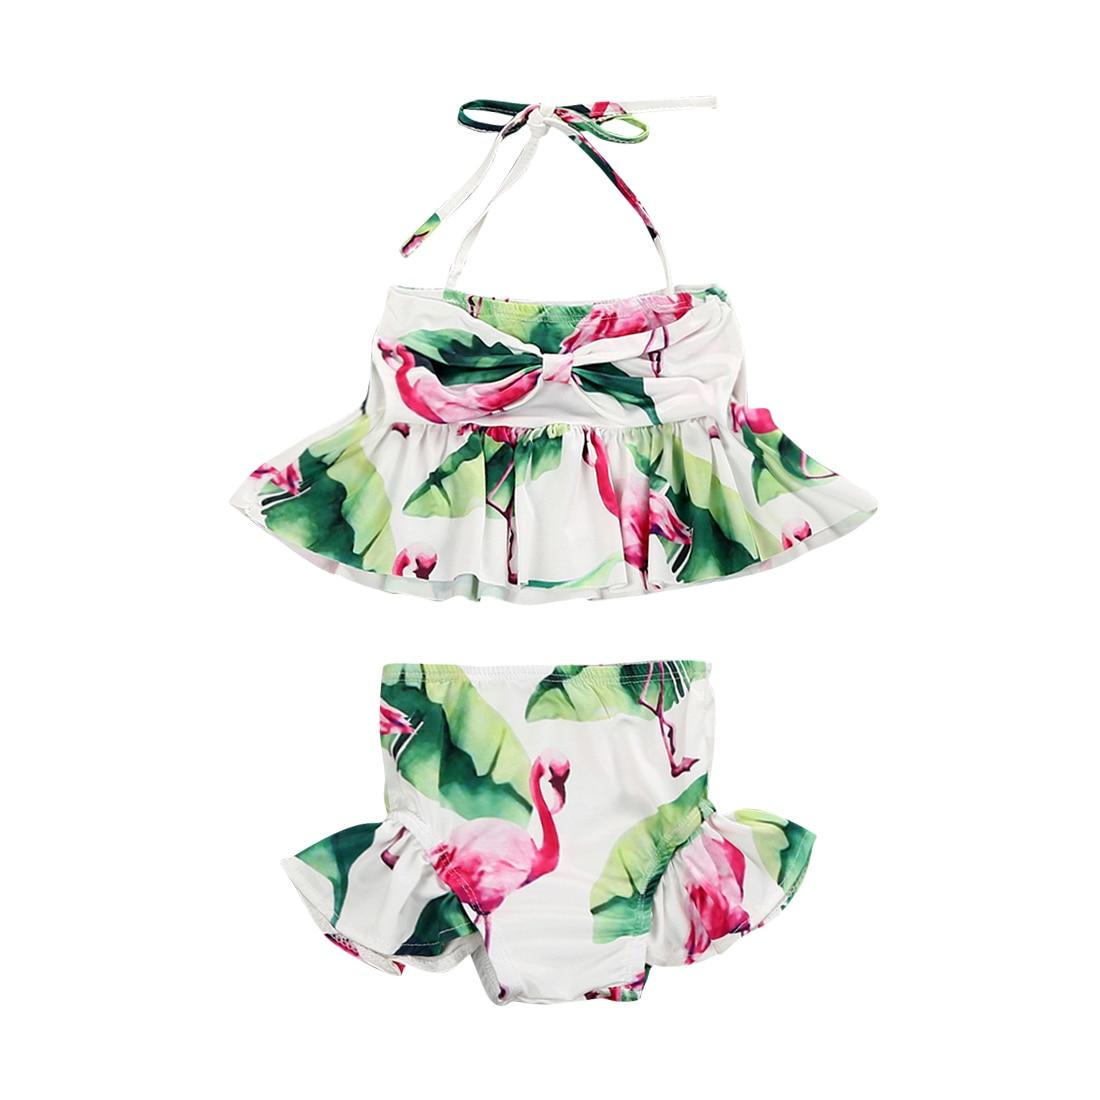 Kid Baby Girls Flamingo Two-piece Tankini Swimwear Little Girl Swimsuit Bikini Bathing Suit Beachwear Купальник